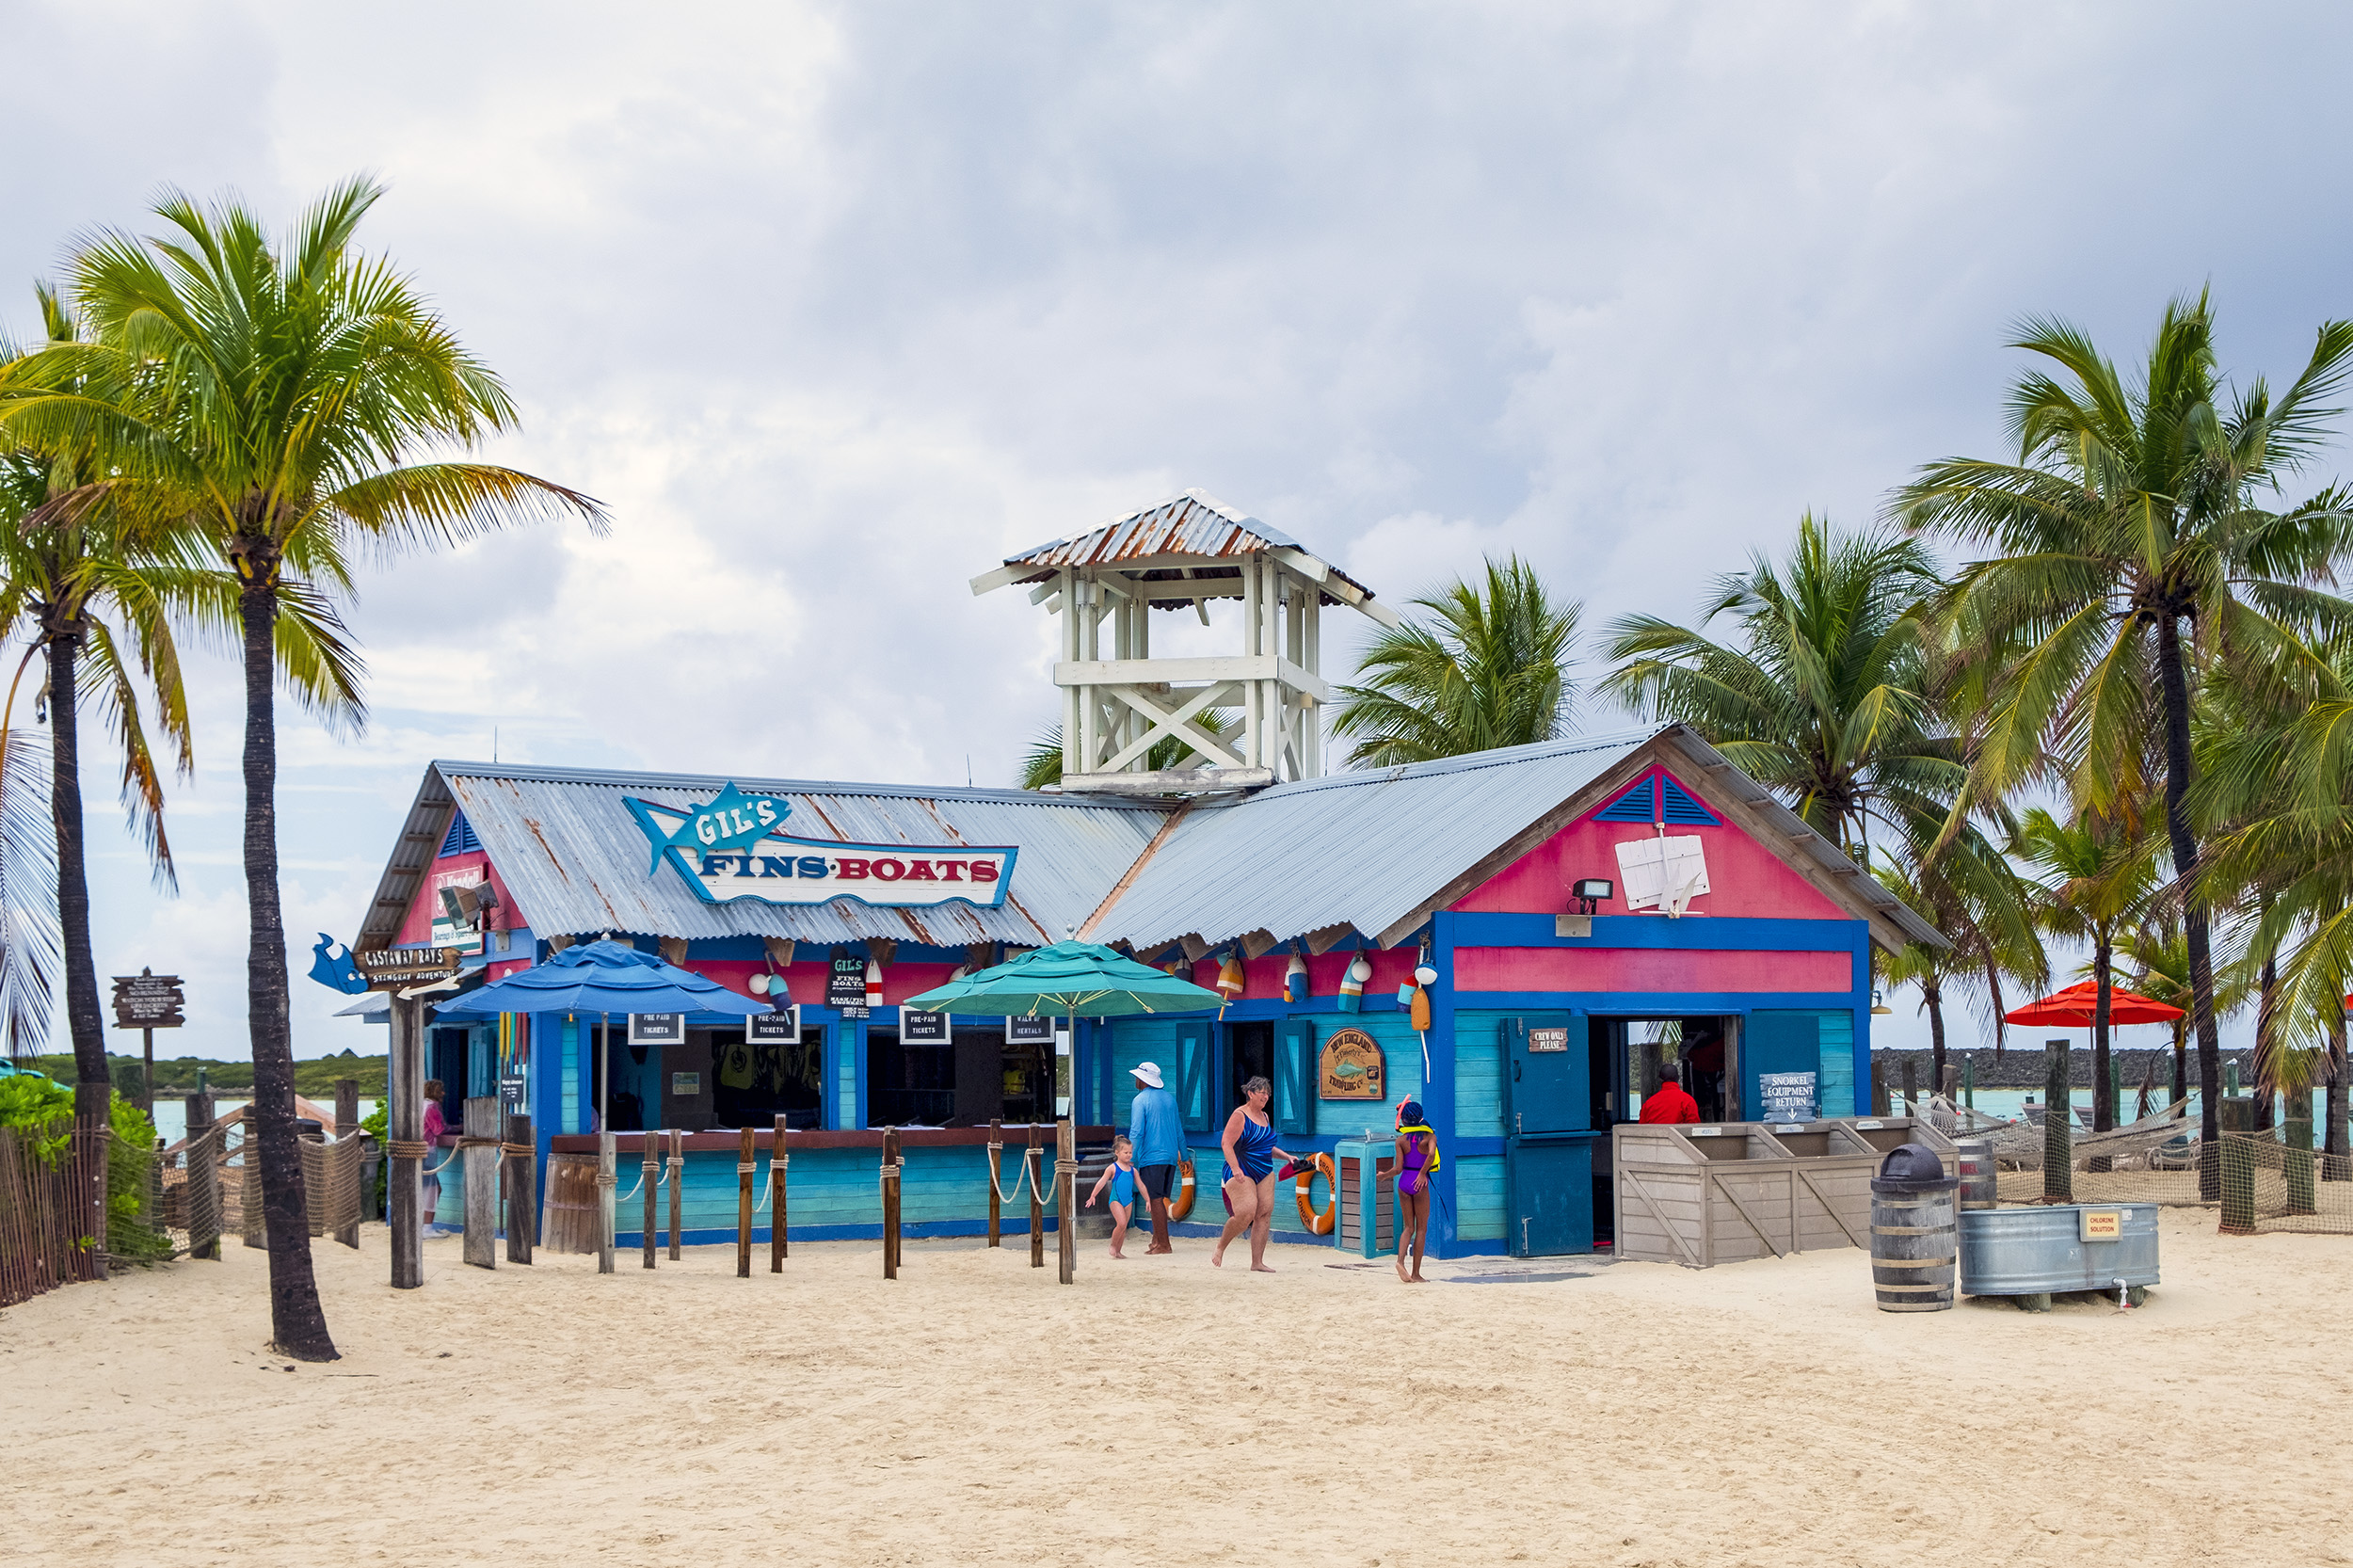 Castaway Cay Gil's Fins & Boats